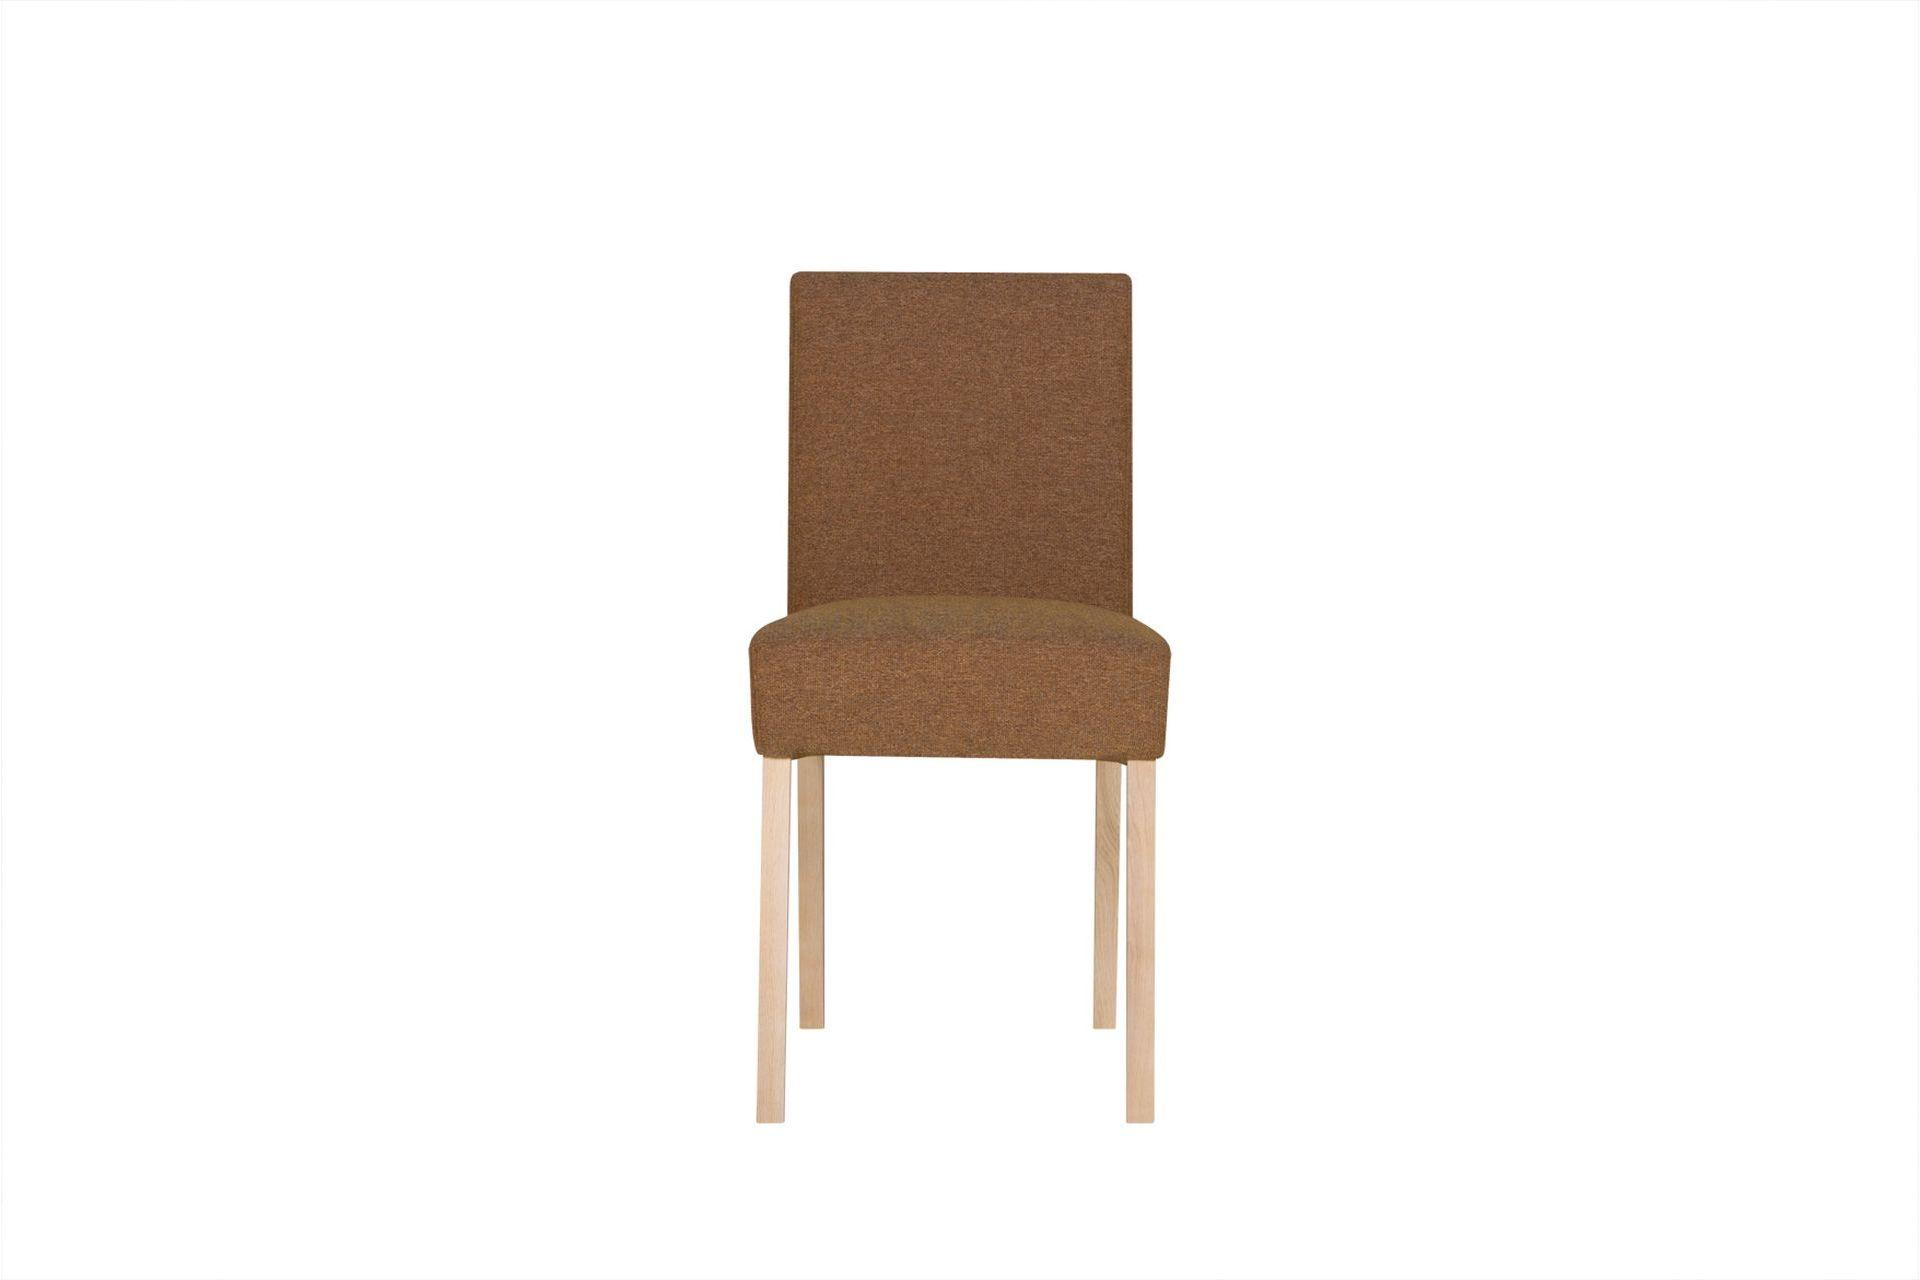 Кухонный стул Sits 15447048 от thefurnish